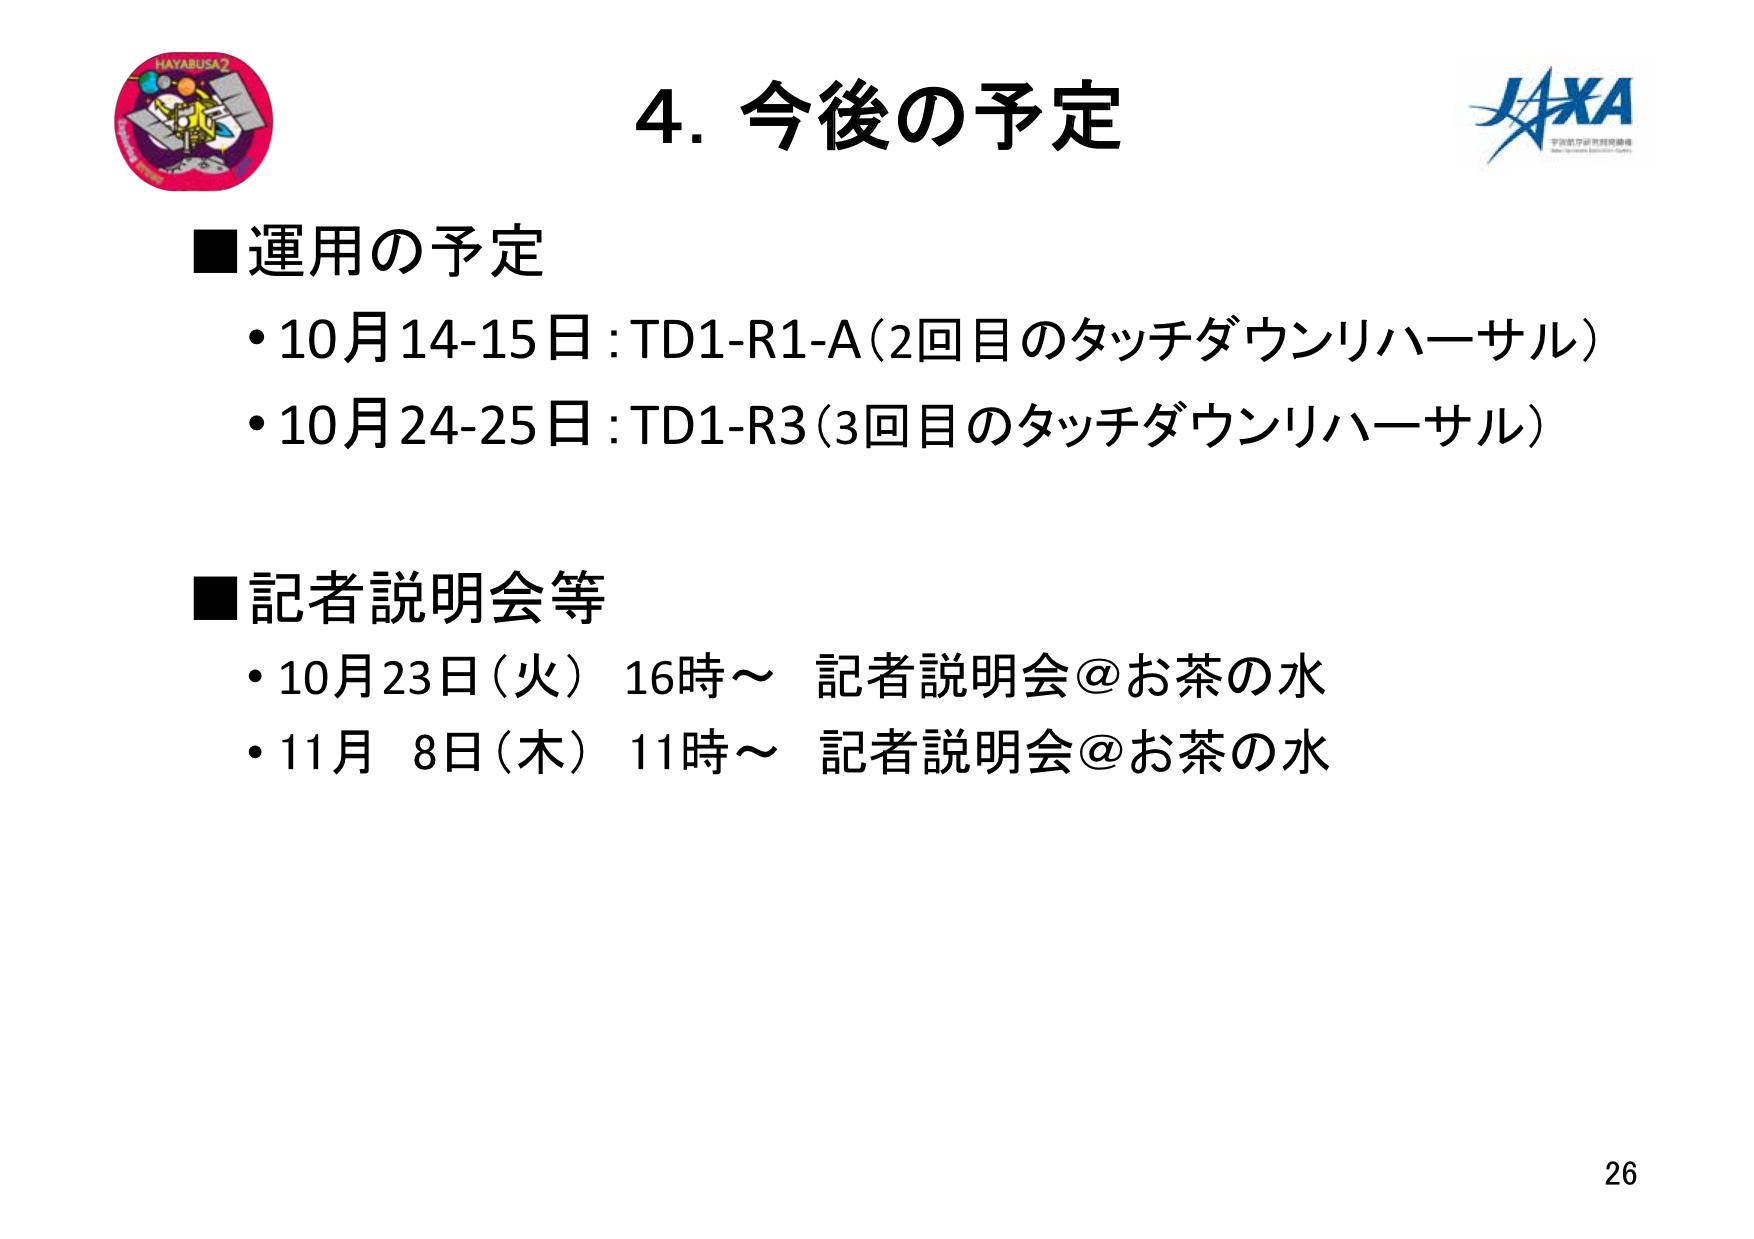 f:id:Imamura:20181011154005p:plain